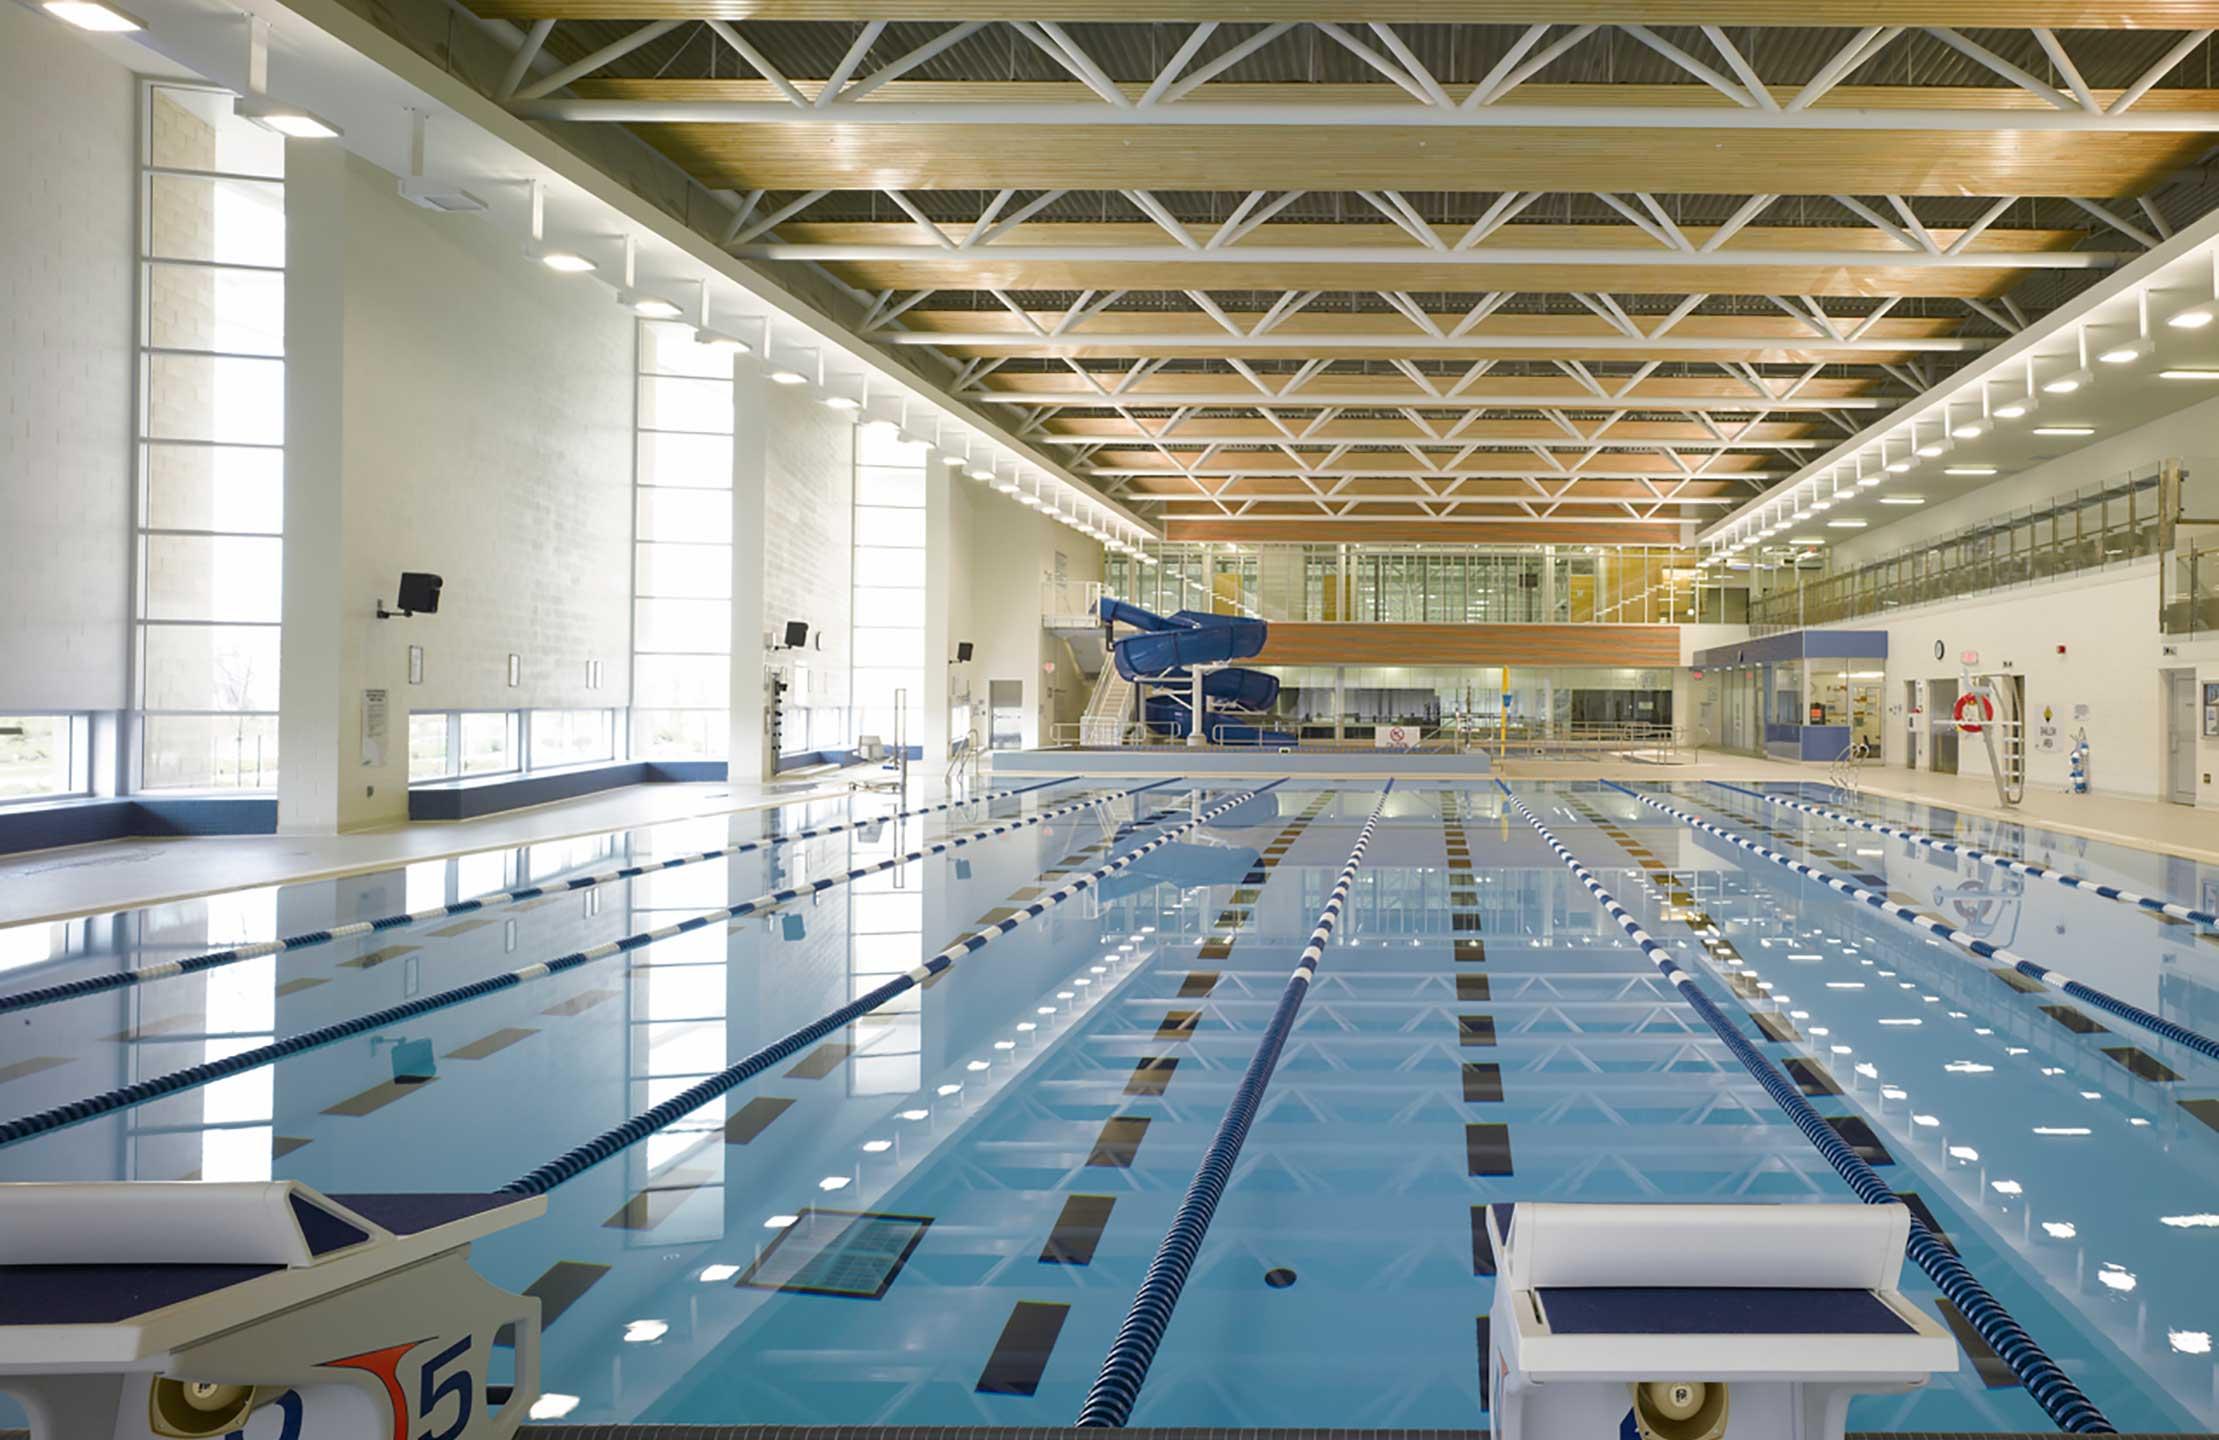 Bradford West Gwillimbury Leisure Centre